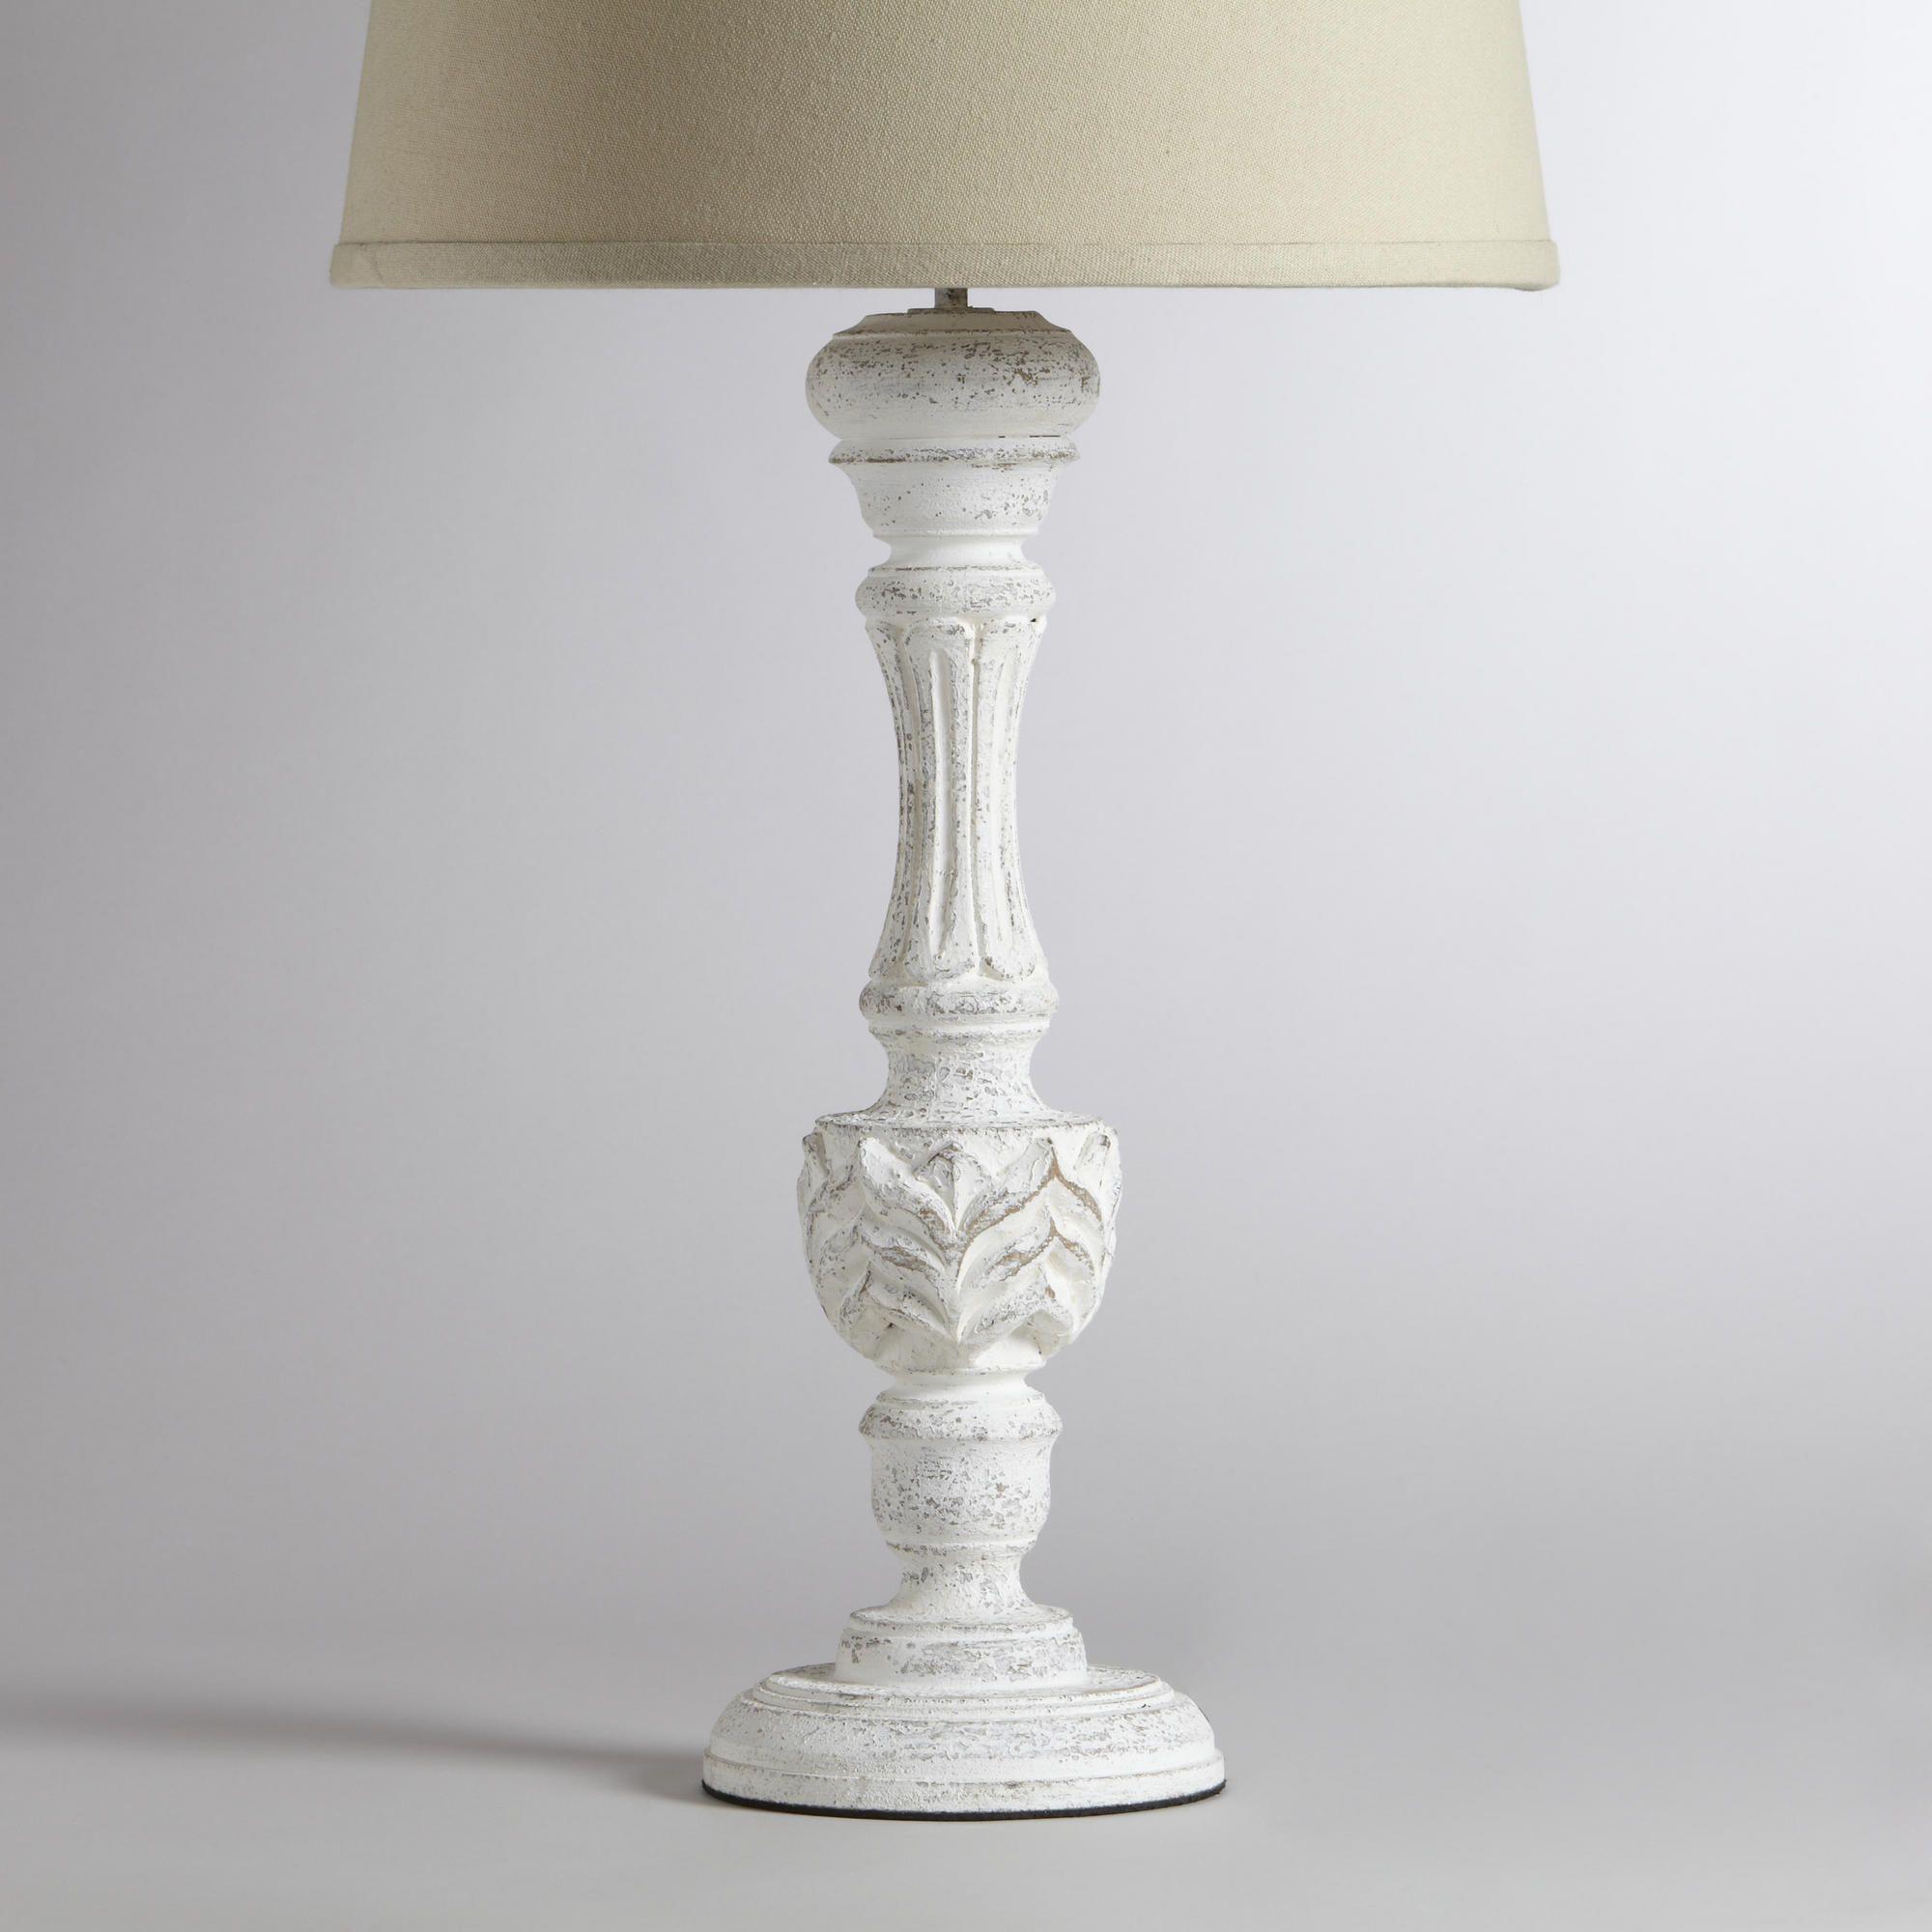 Klara Antique Candlestick Table Lamp Base World Market $49.99